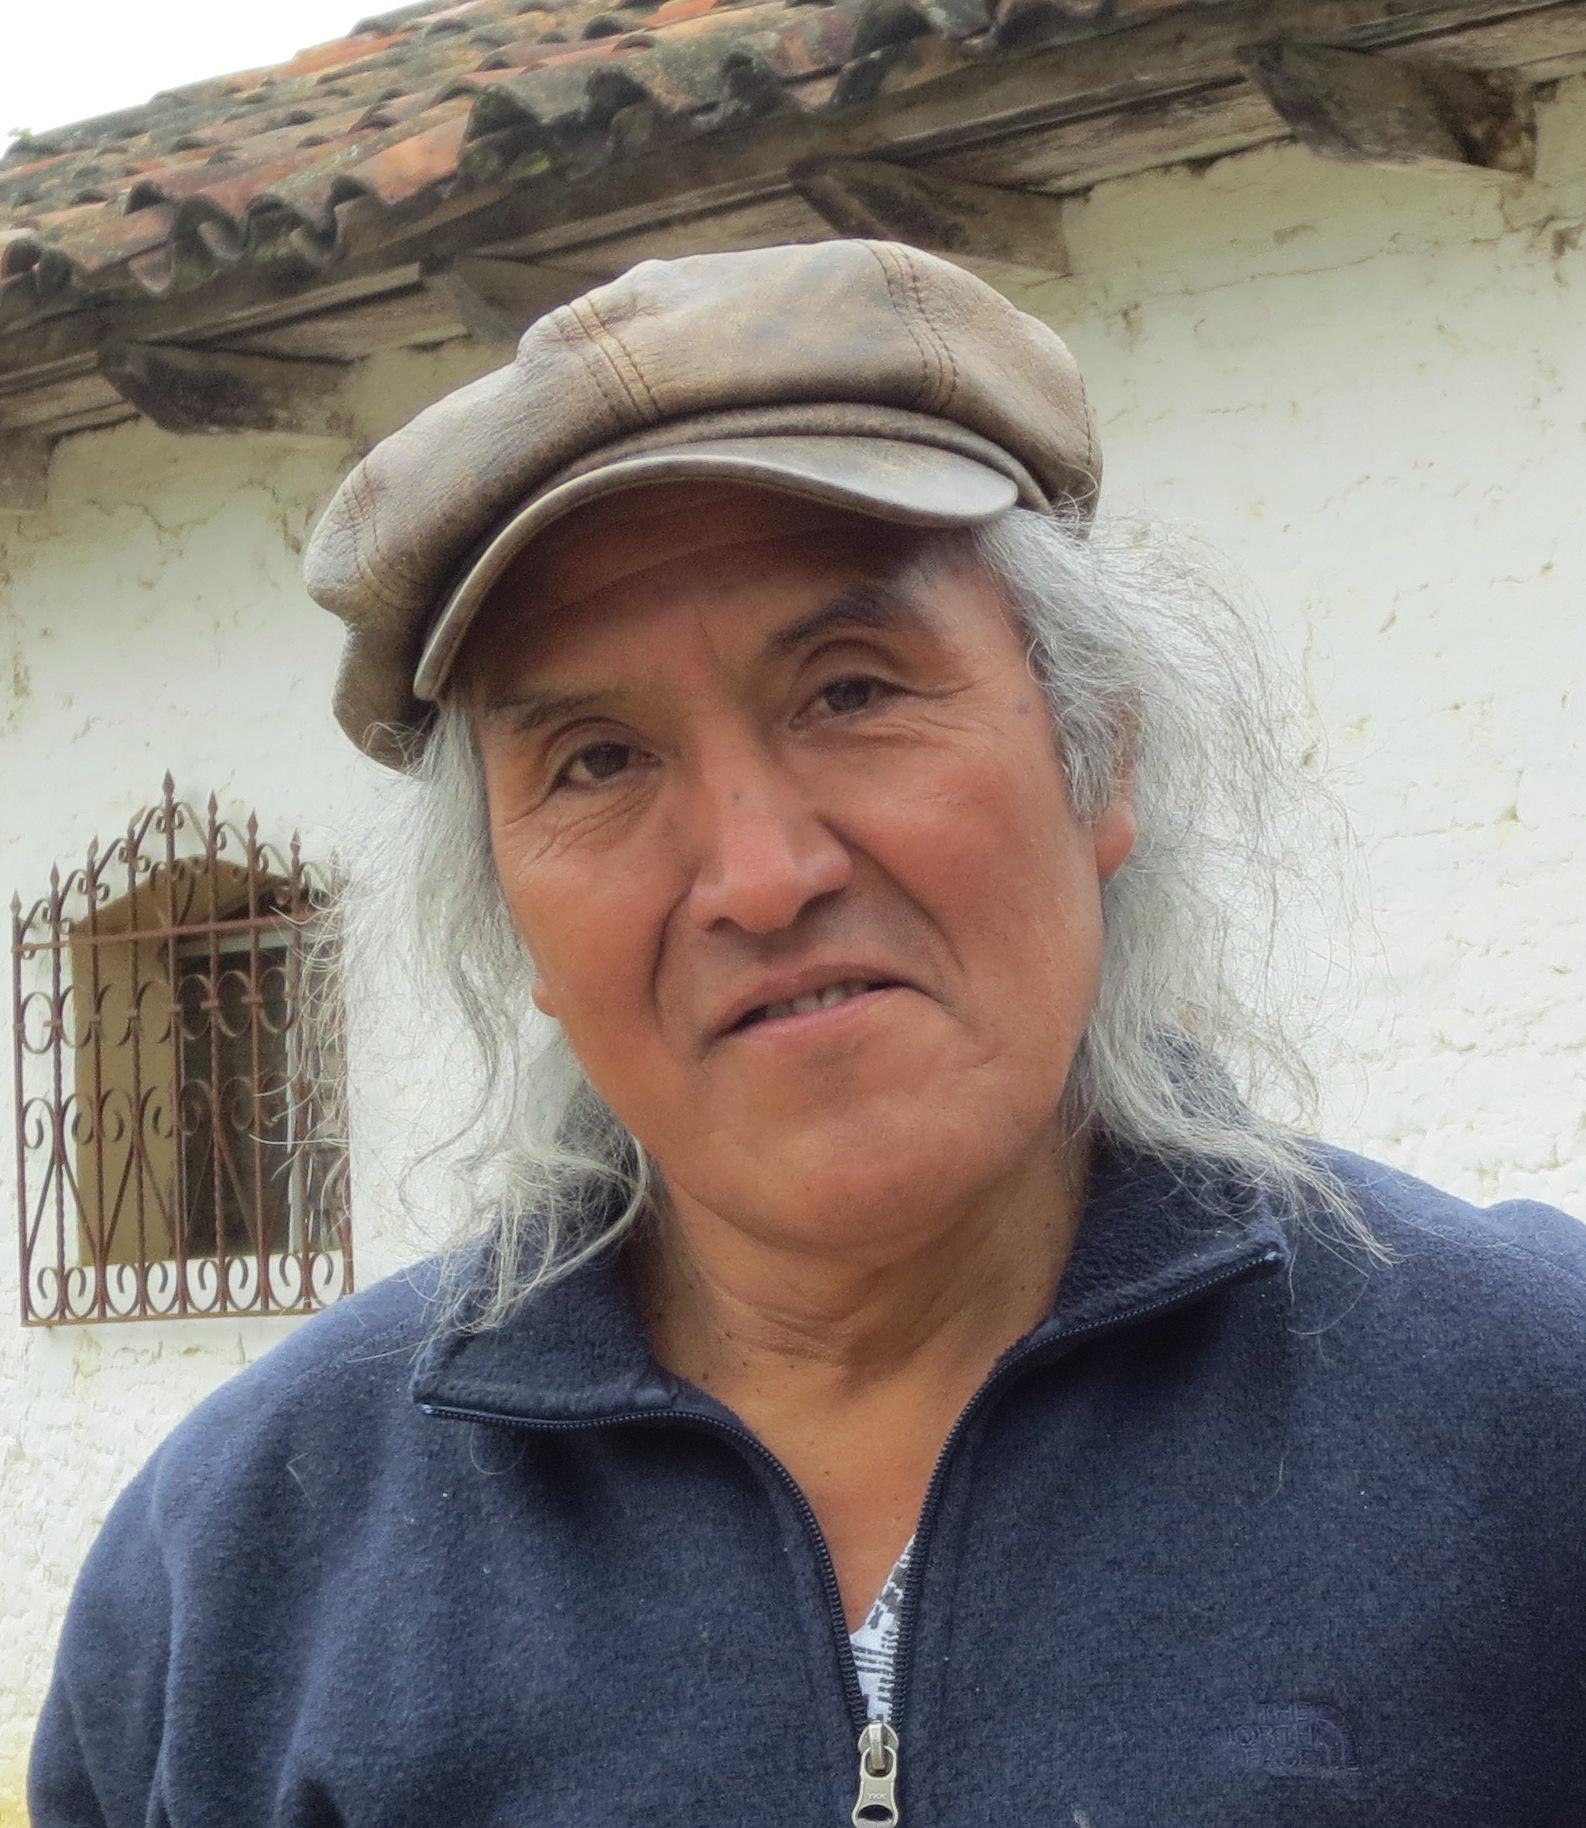 Humberto Akabal